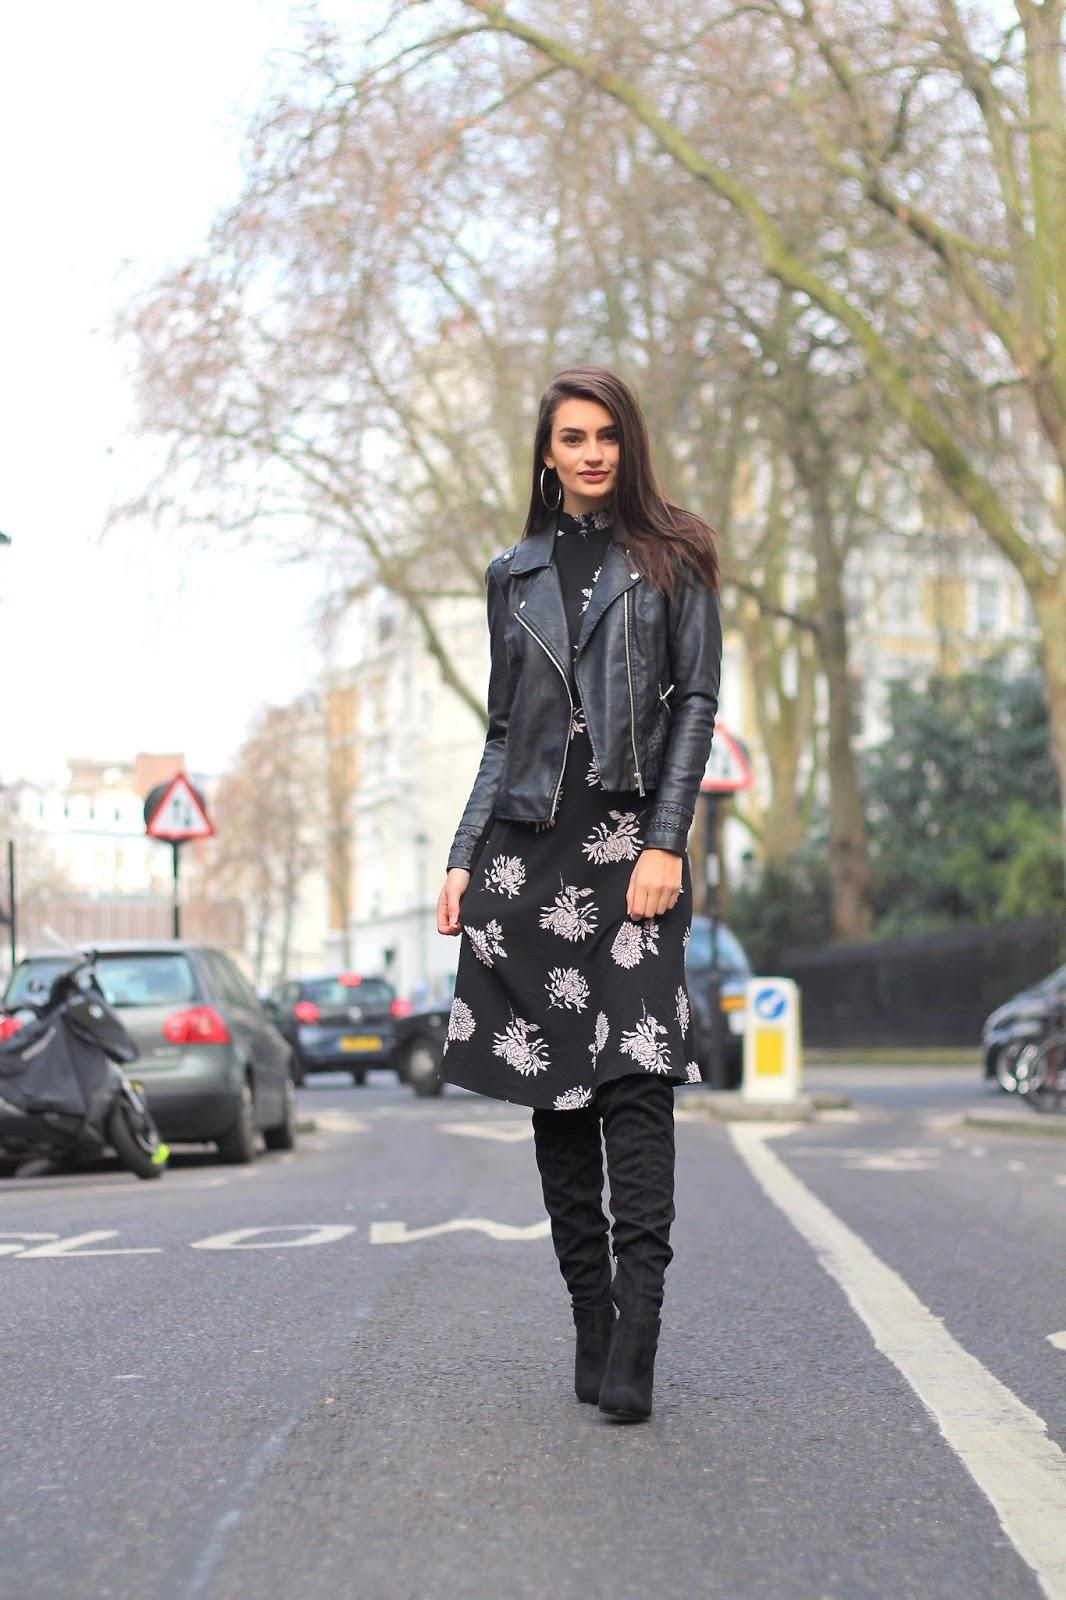 peexo street style blogger